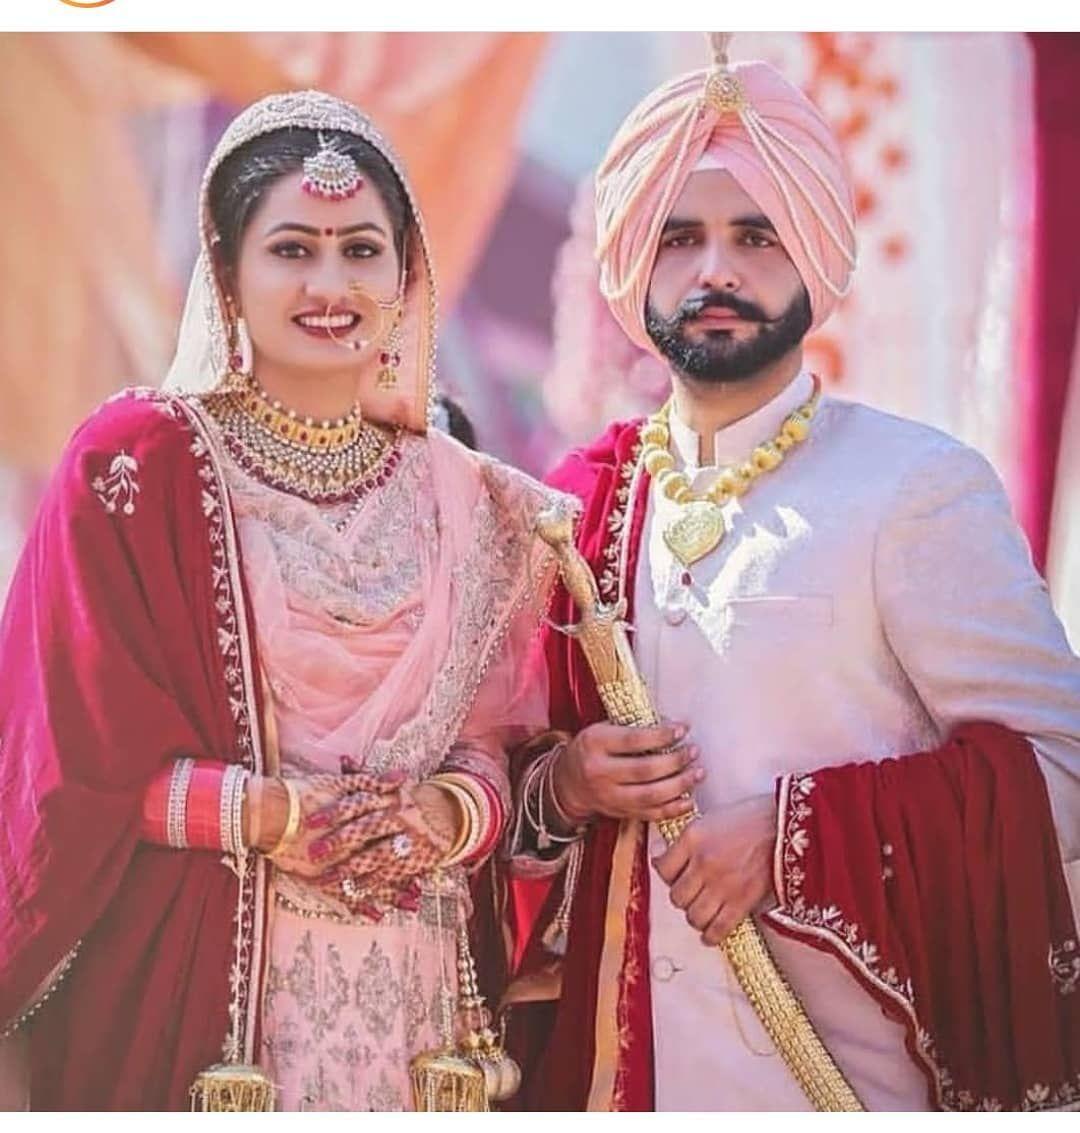 Best Punjabi Couple Pics Images Wallpapers Shayaristatus Com Indian Wedding Couple Punjabi Couple Indian Wedding Outfits